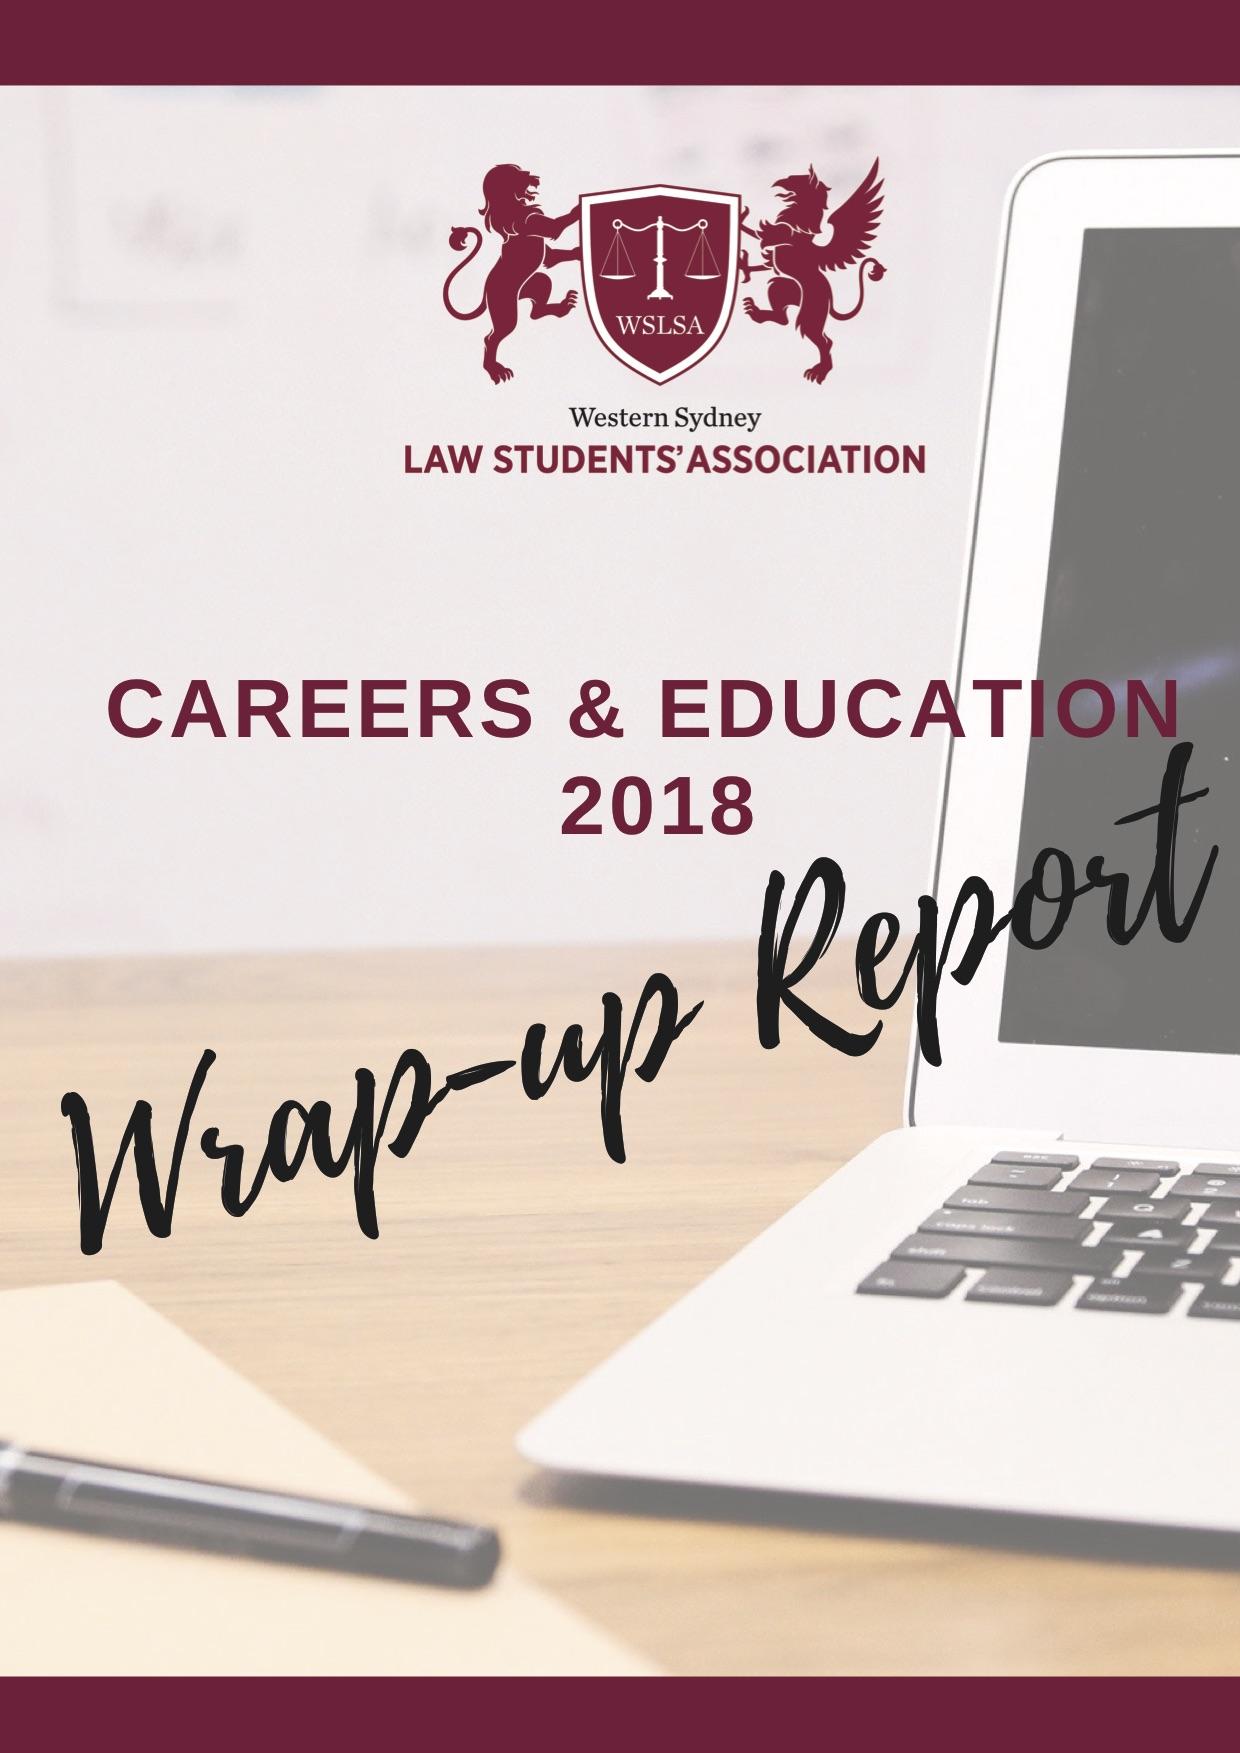 Careers & Education 2018 Wrap-up Report - final version.jpg